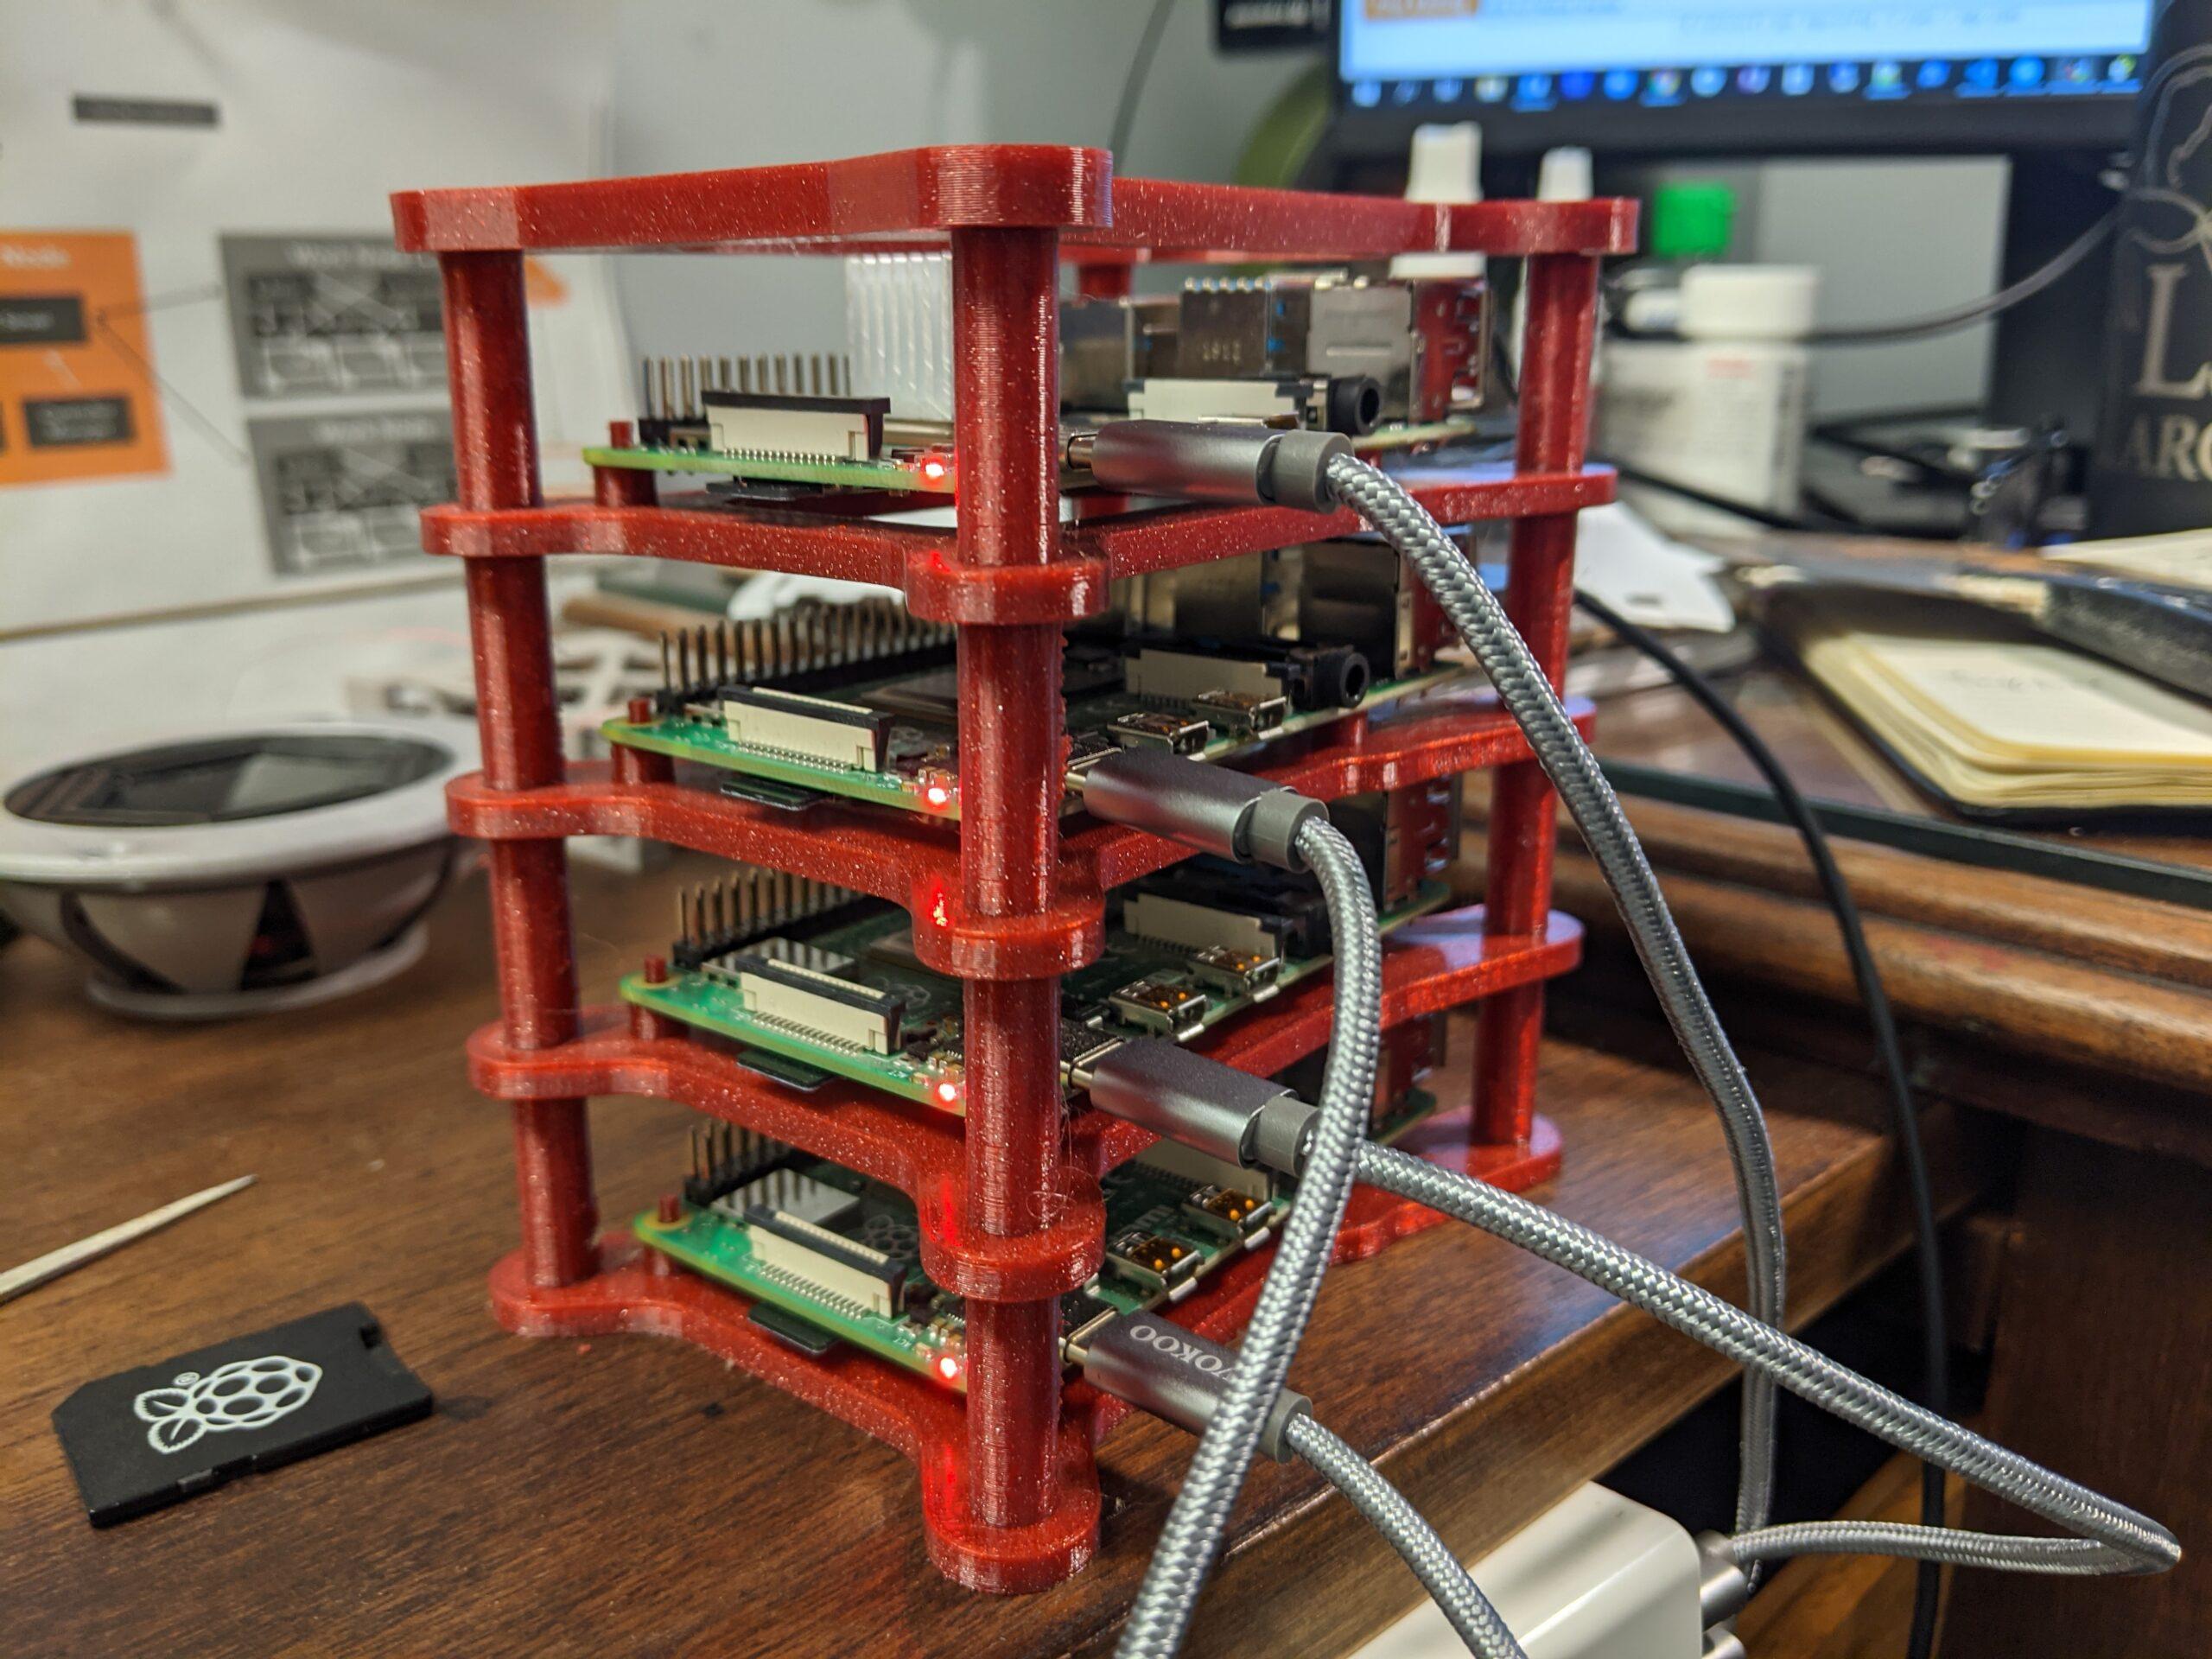 Raspberry Pi K8S Cluster